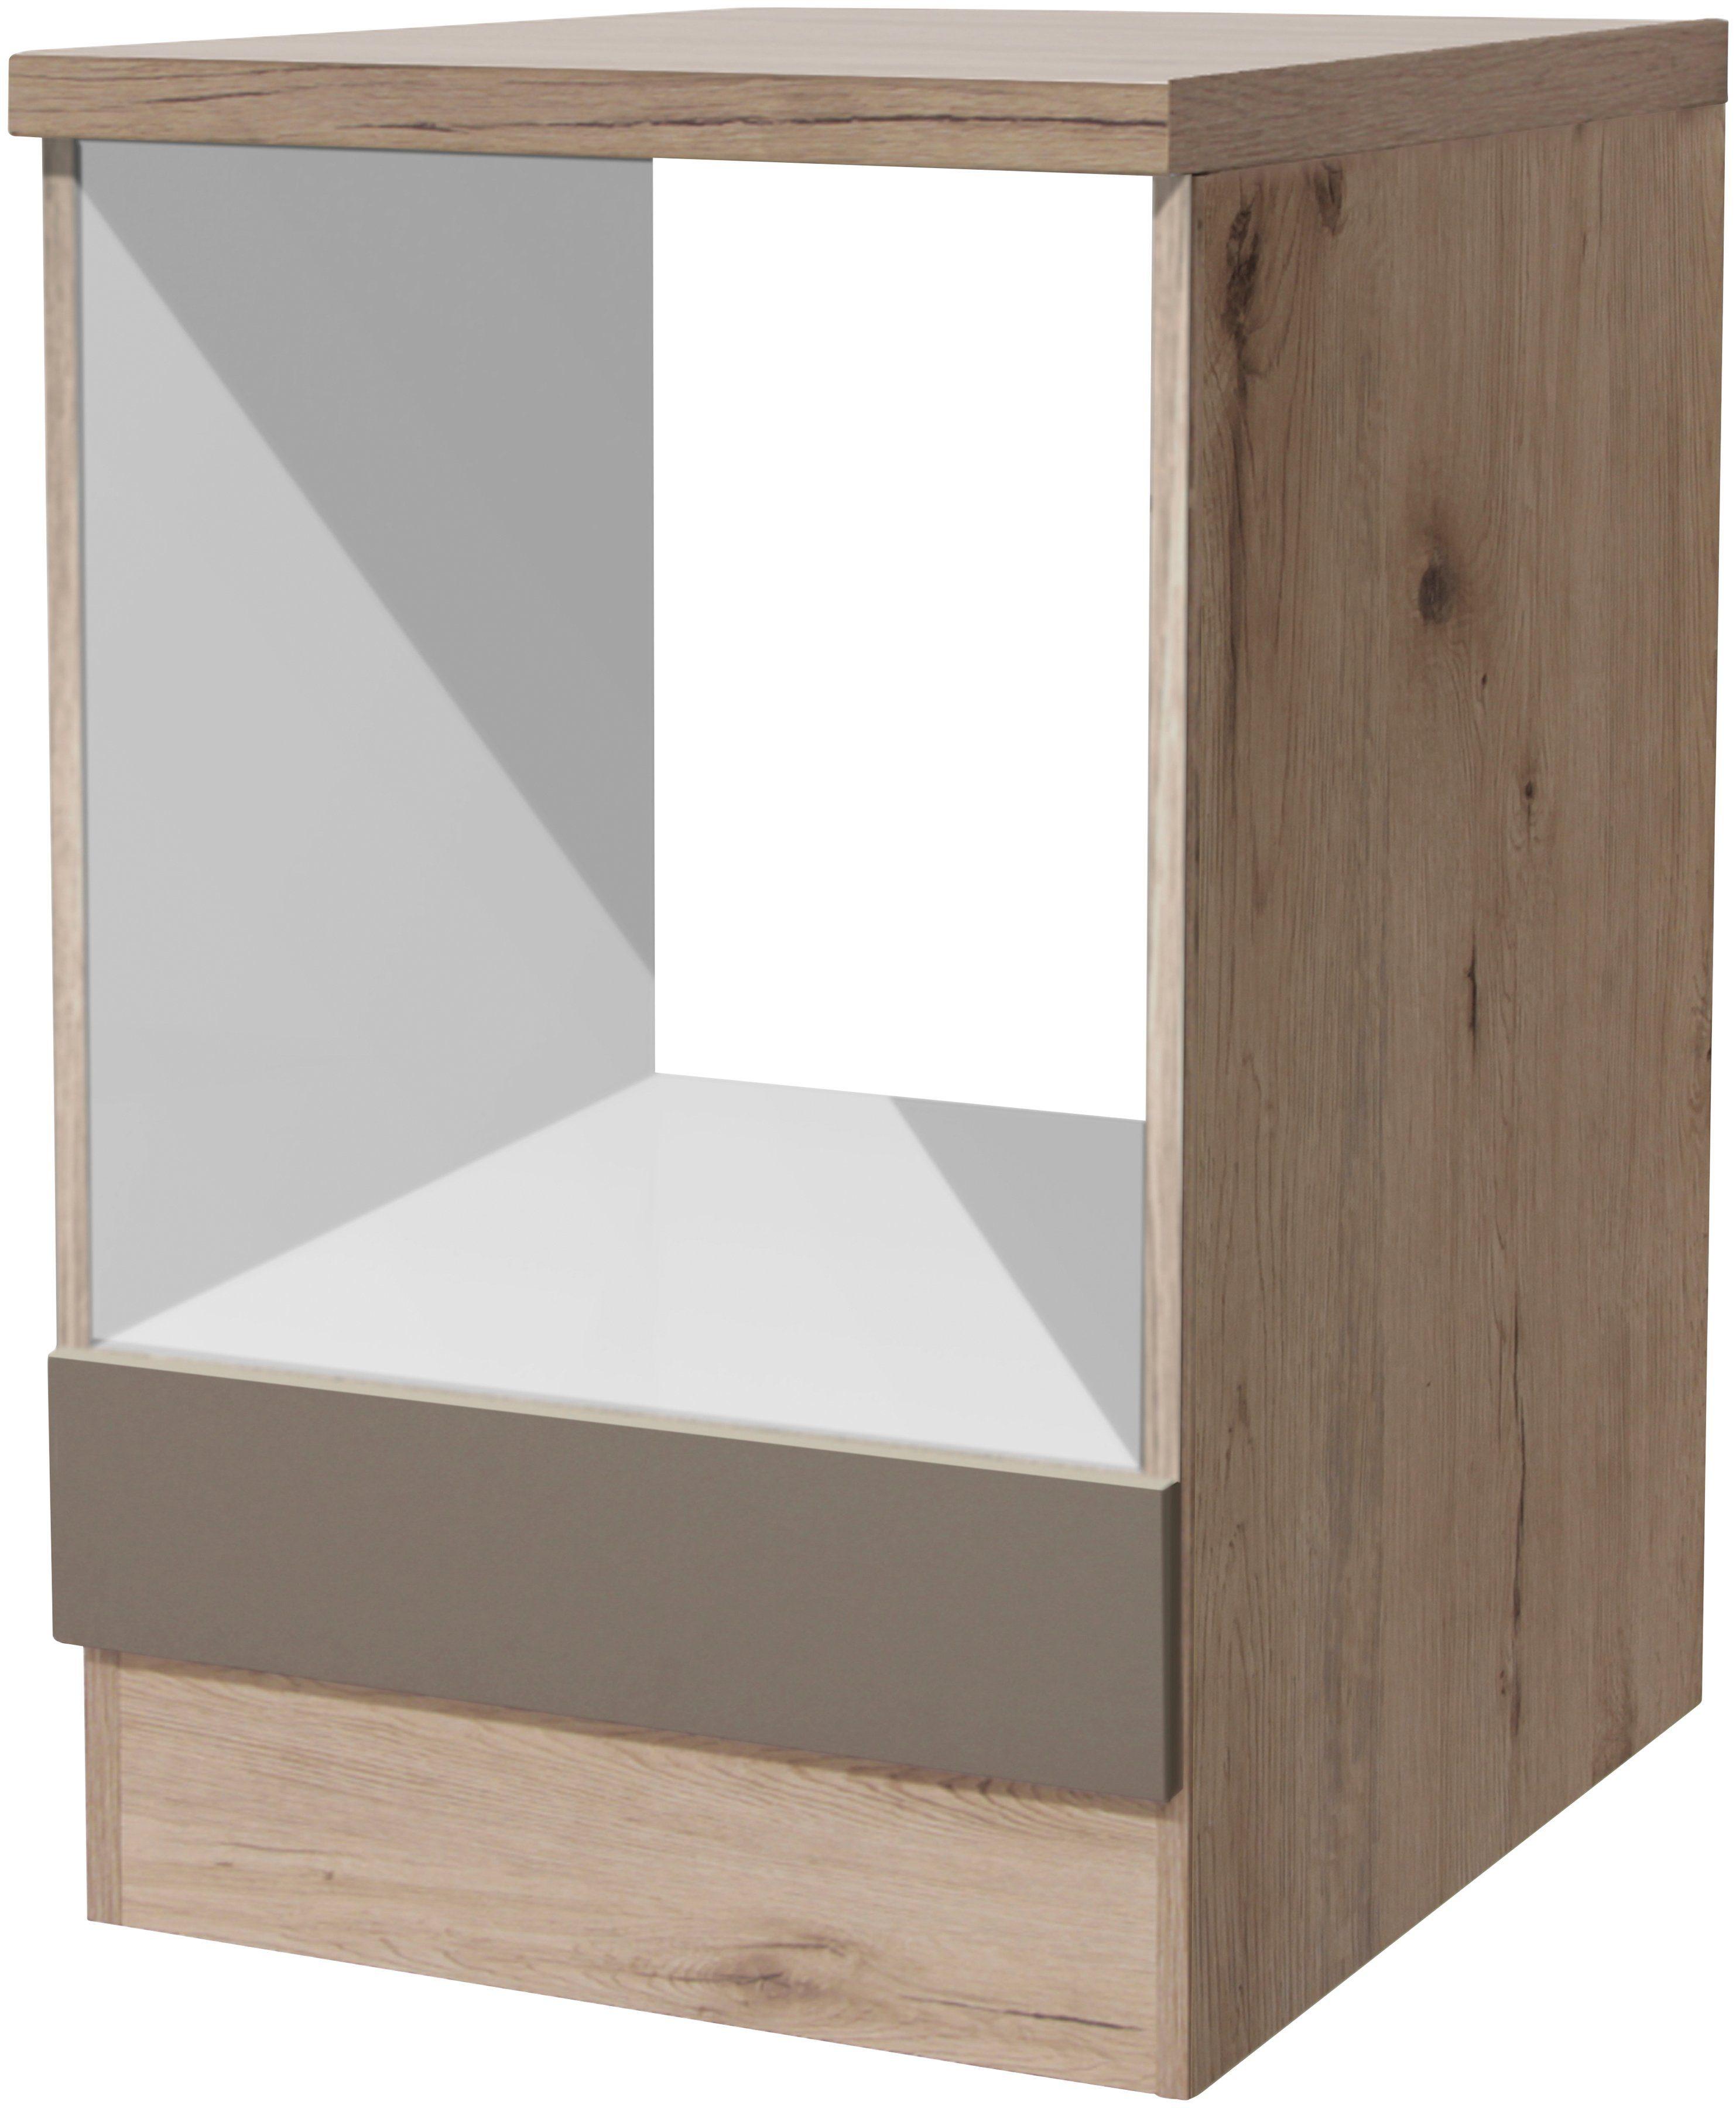 Herdumbauschrank »Riva, Breite 60 cm «